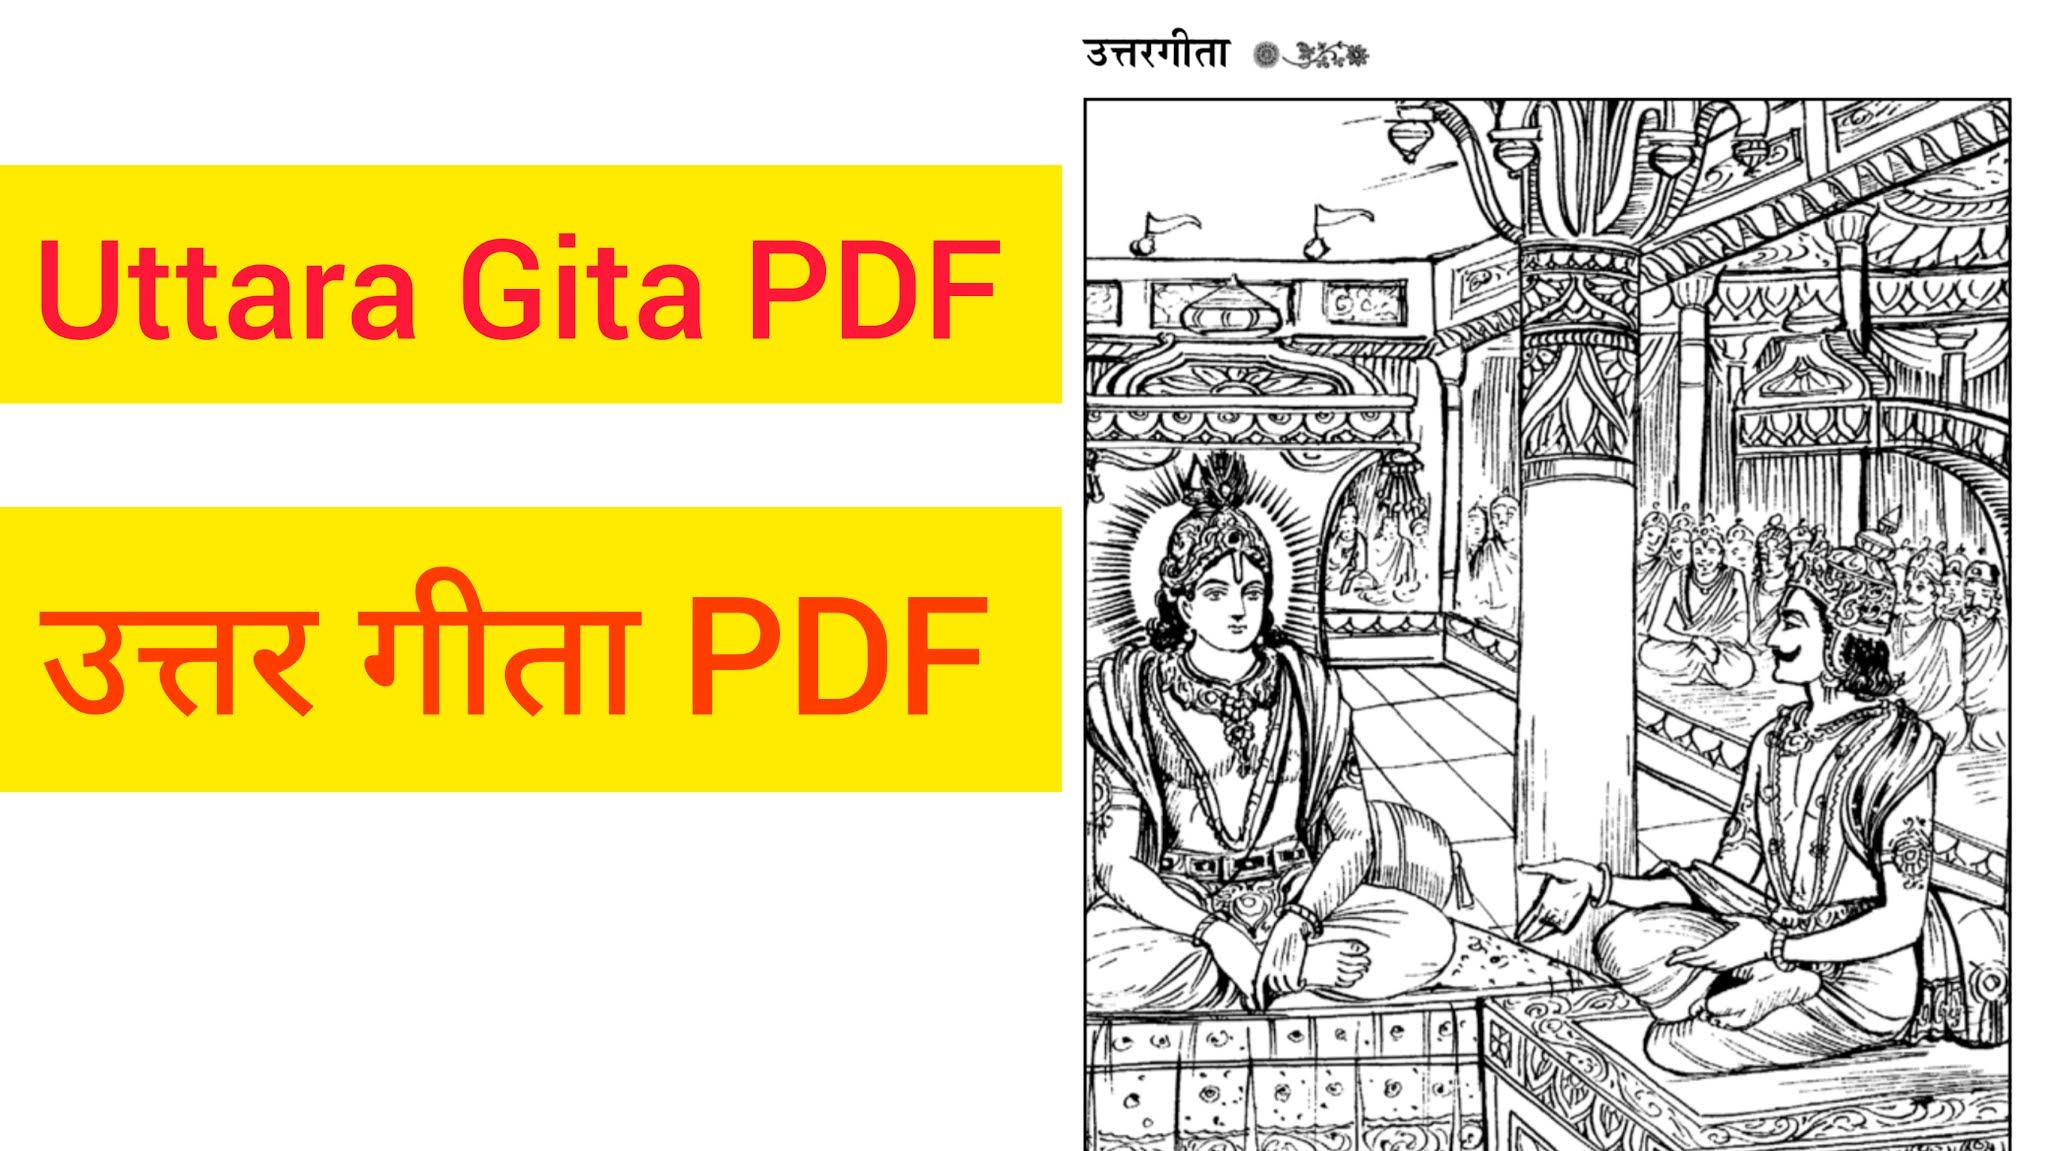 Uttar Gita PDF